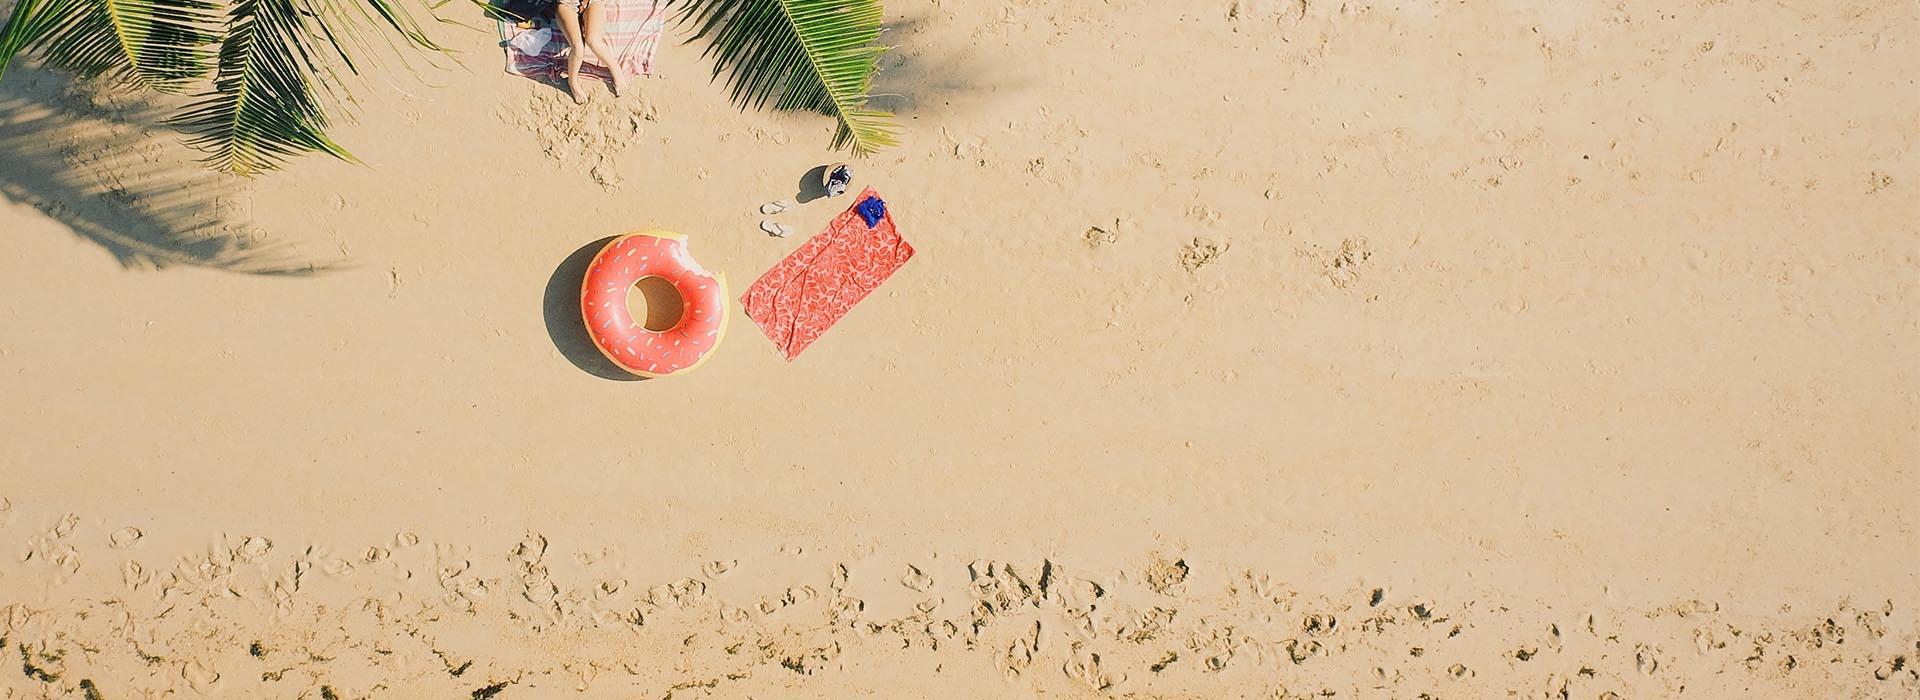 10 Best Summer Destinations of the World